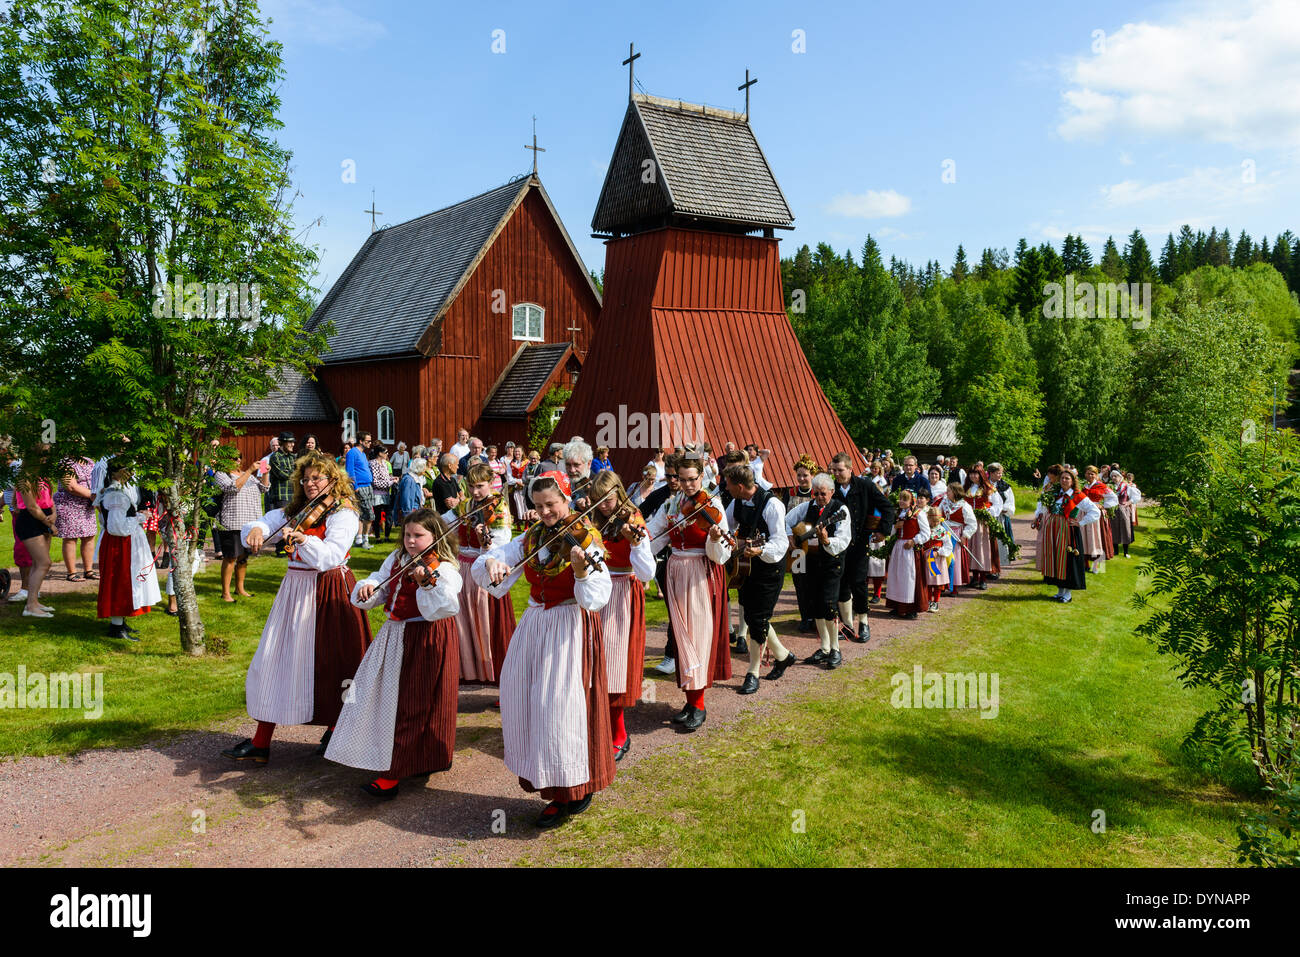 People celebrating midsummer festival, Evertsberg, Dalarna, Sweden - Stock Image